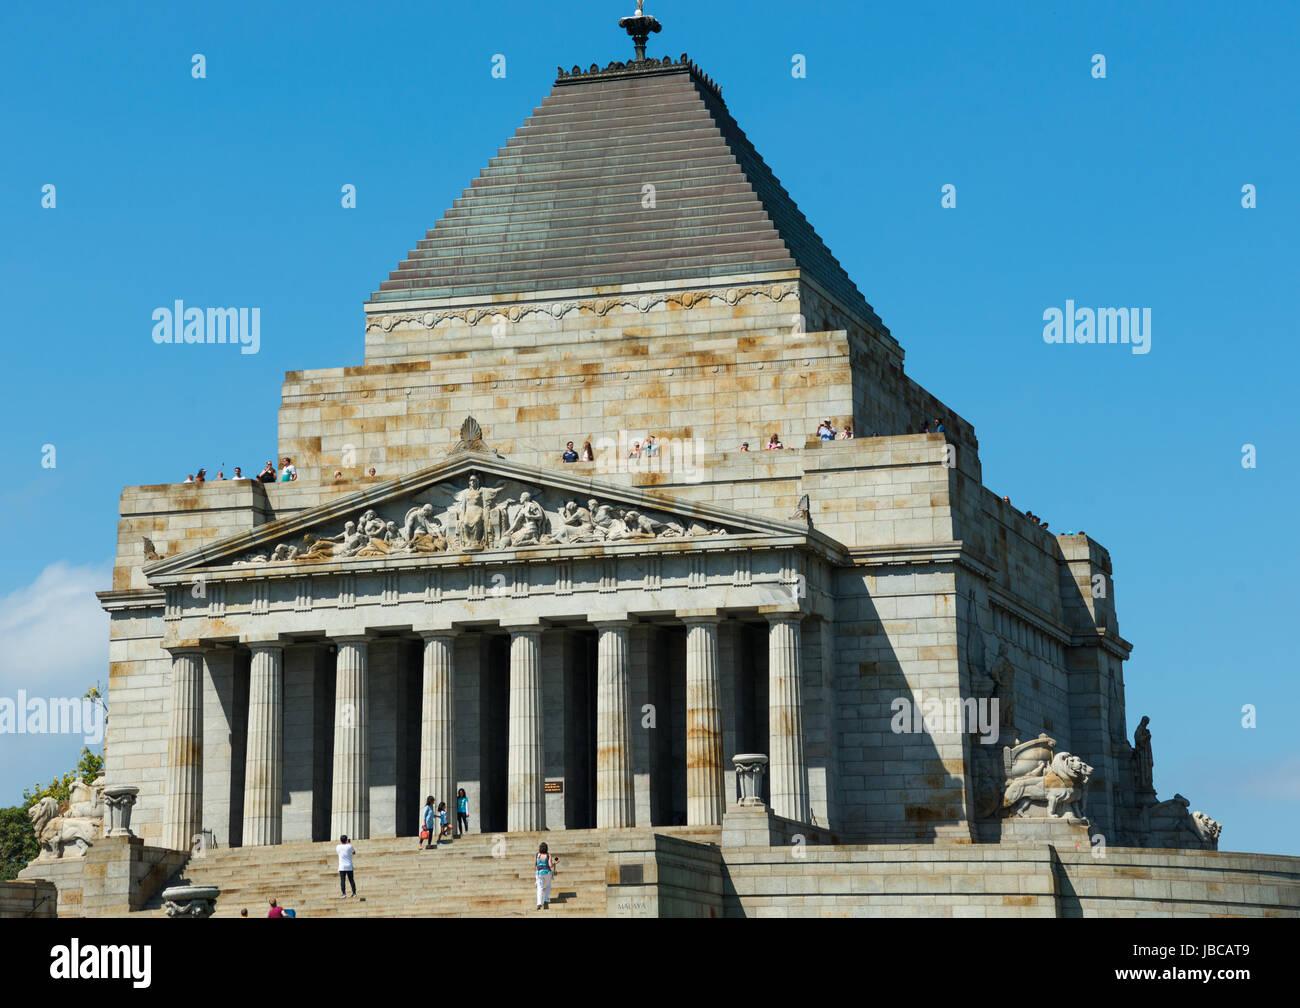 Shrine of Rememberance Melbourne Victoria Australia. - Stock Image